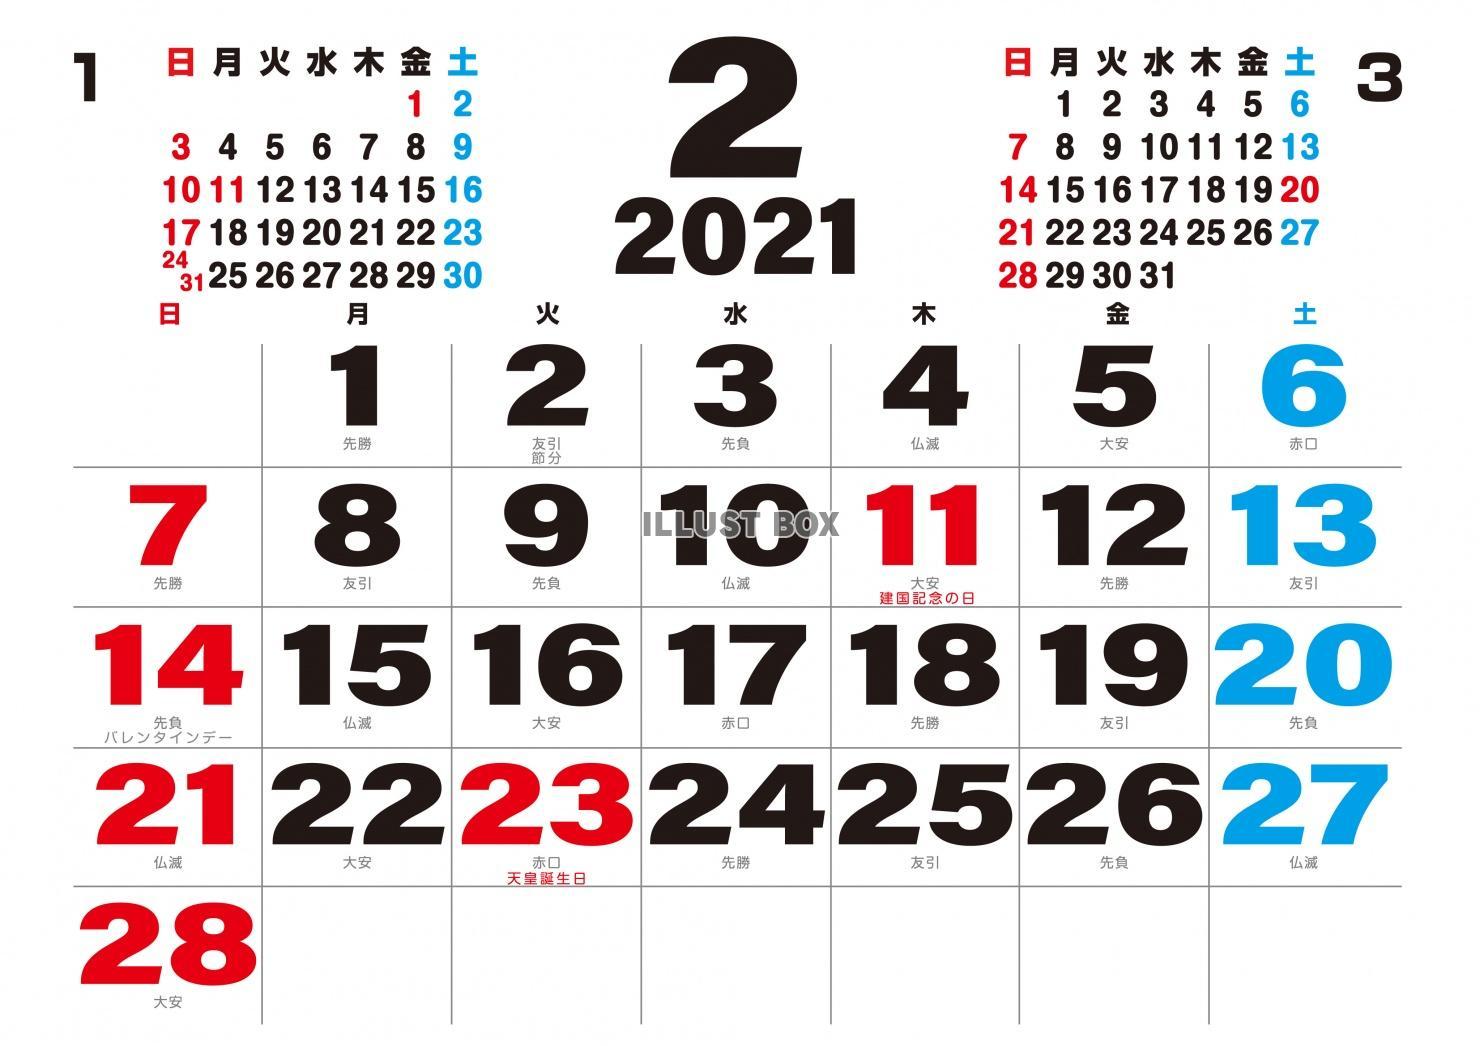 月 大安 年 2 2021